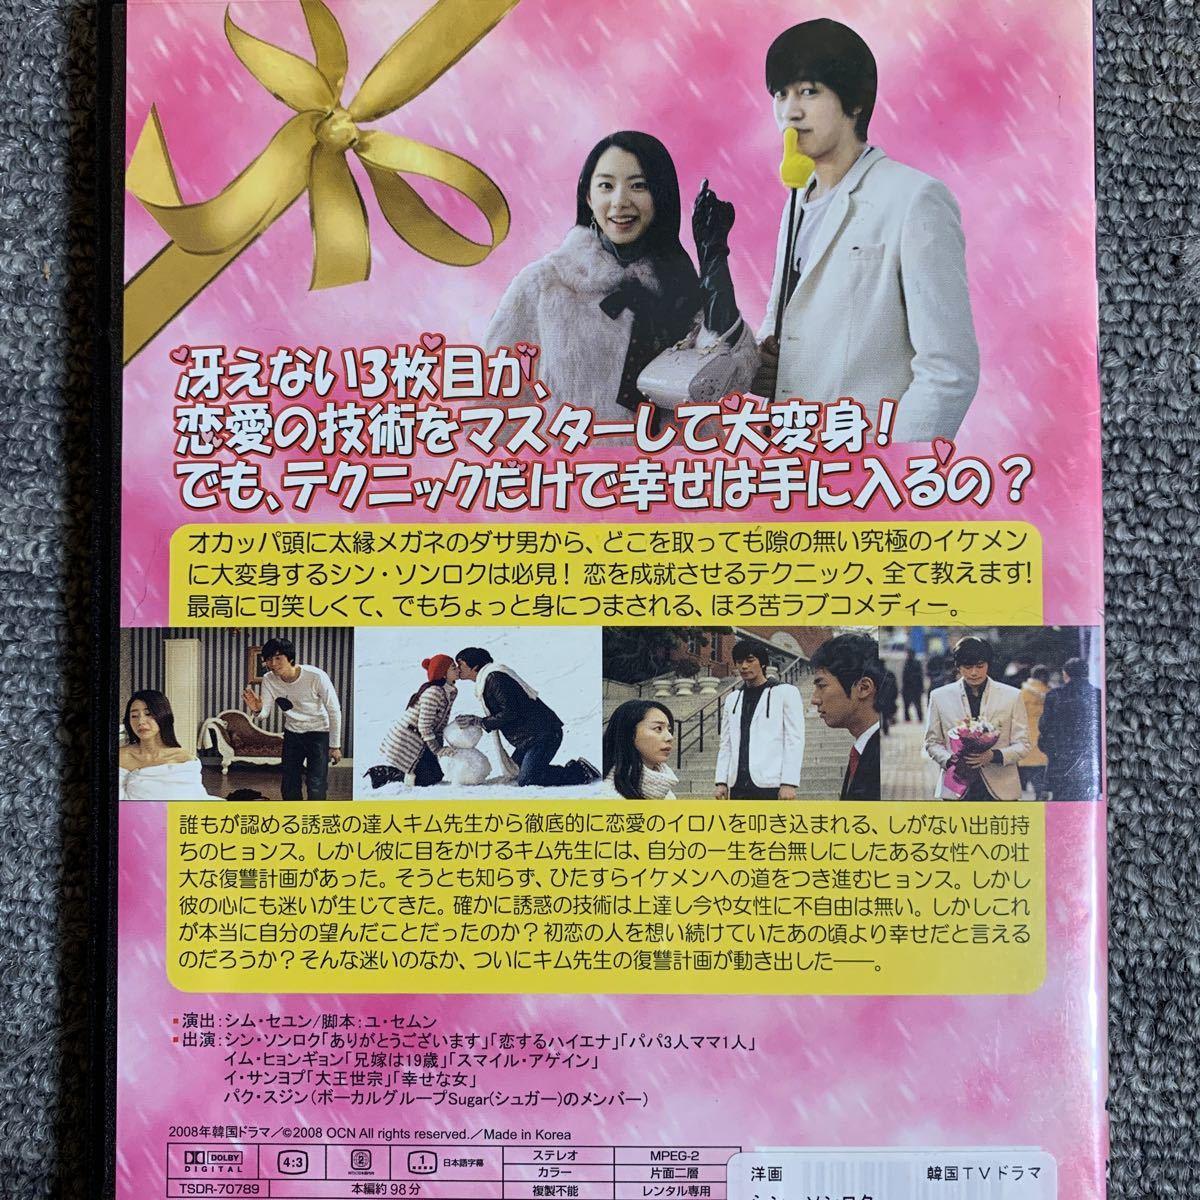 DVD 韓流 誘惑の技術 シン・ソンロク主演 2巻セット レンタル落ち